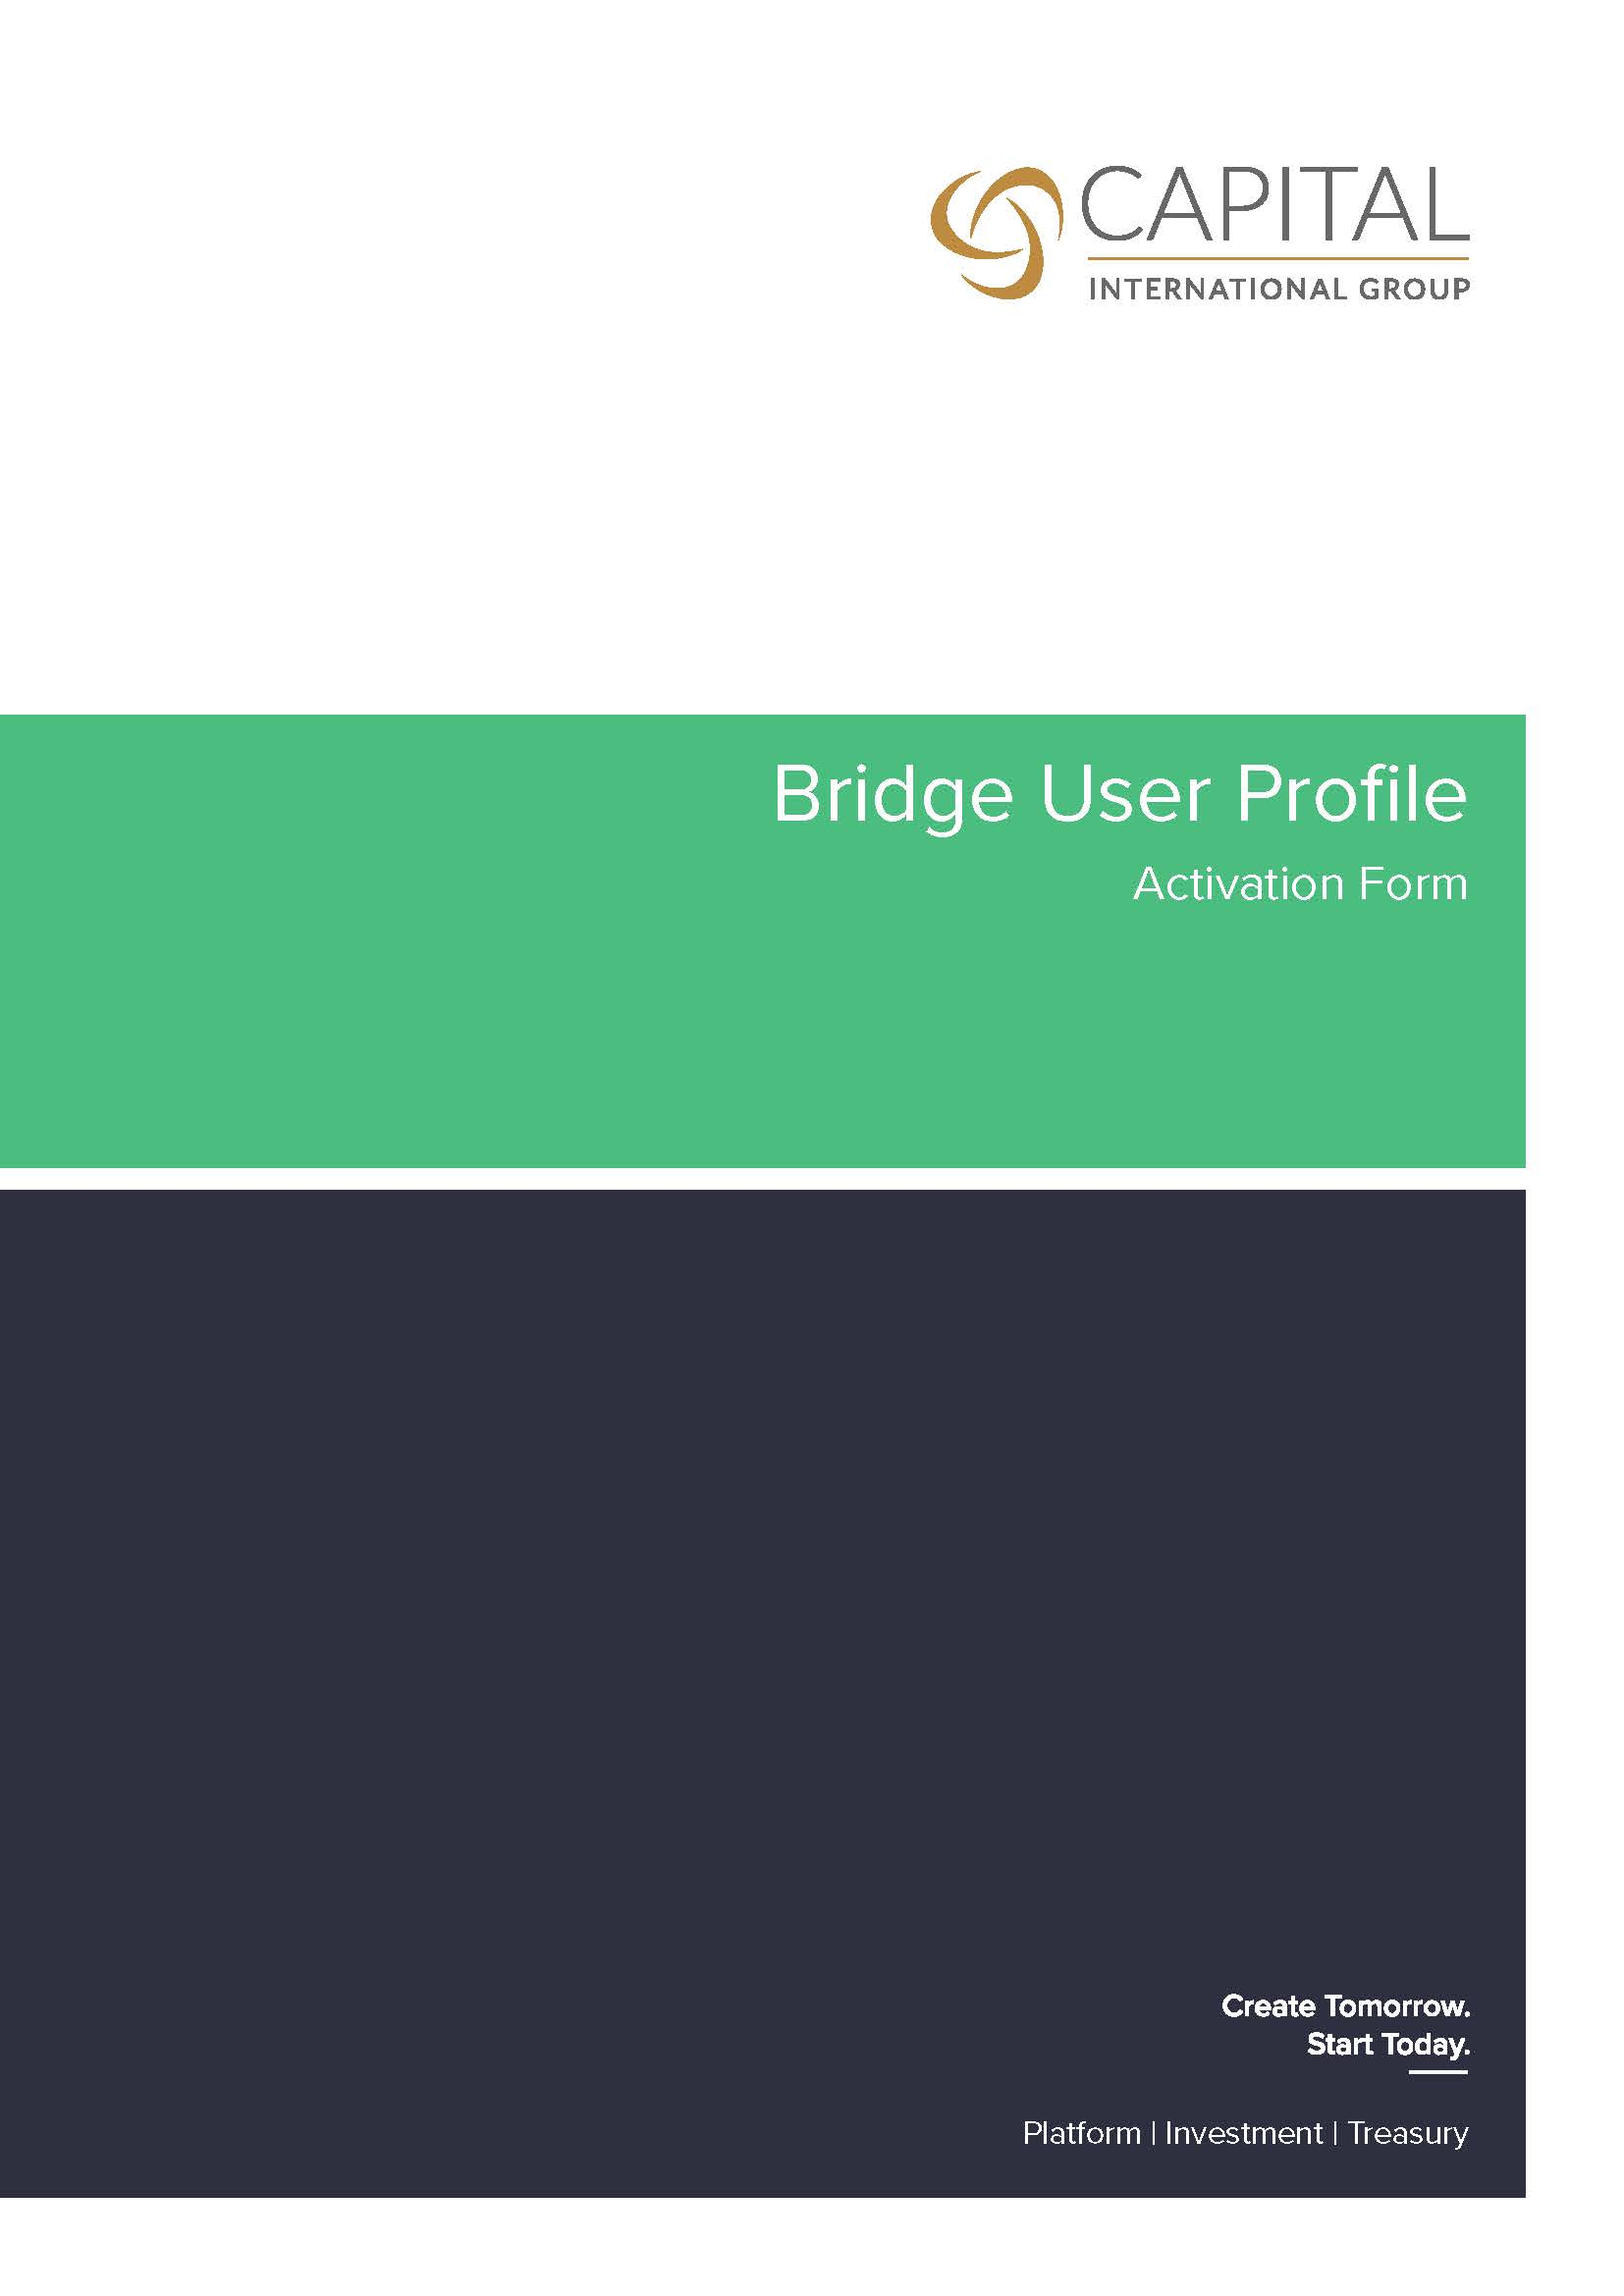 CTS Bridge User Profile Activation Form